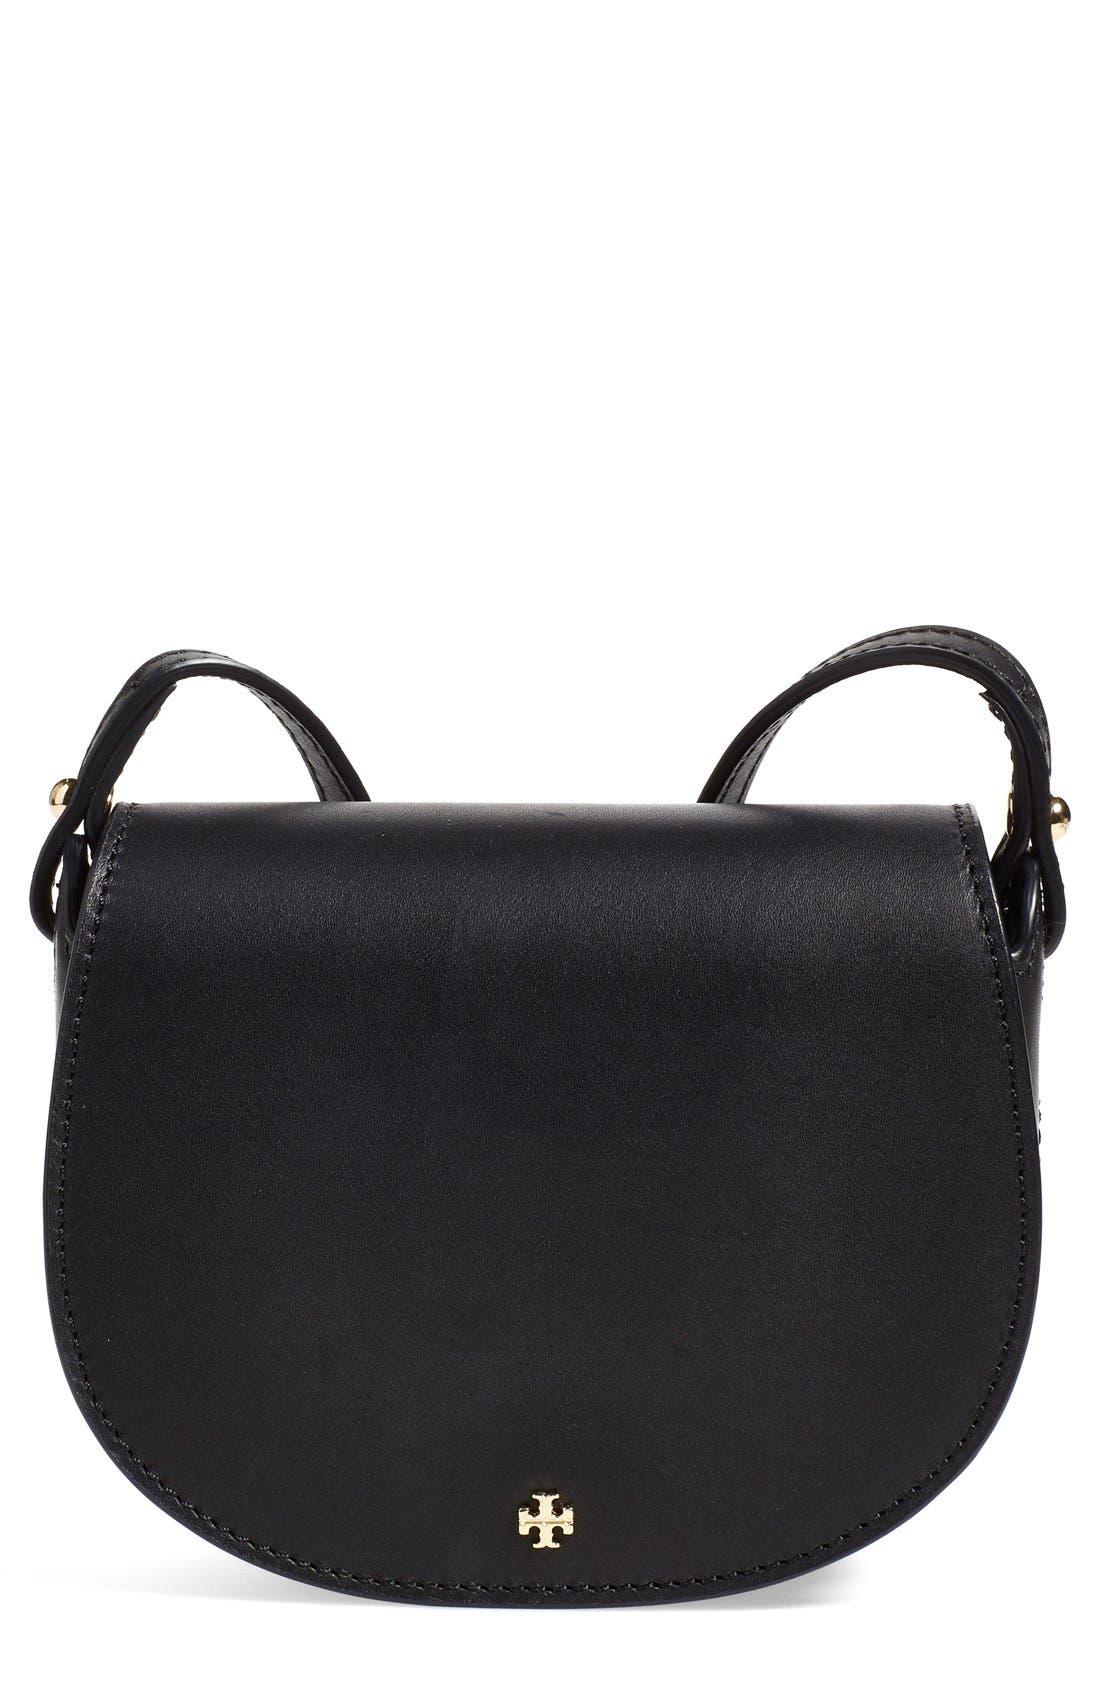 TORY BURCH, 'Mini' Leather Saddle Bag, Main thumbnail 1, color, 009